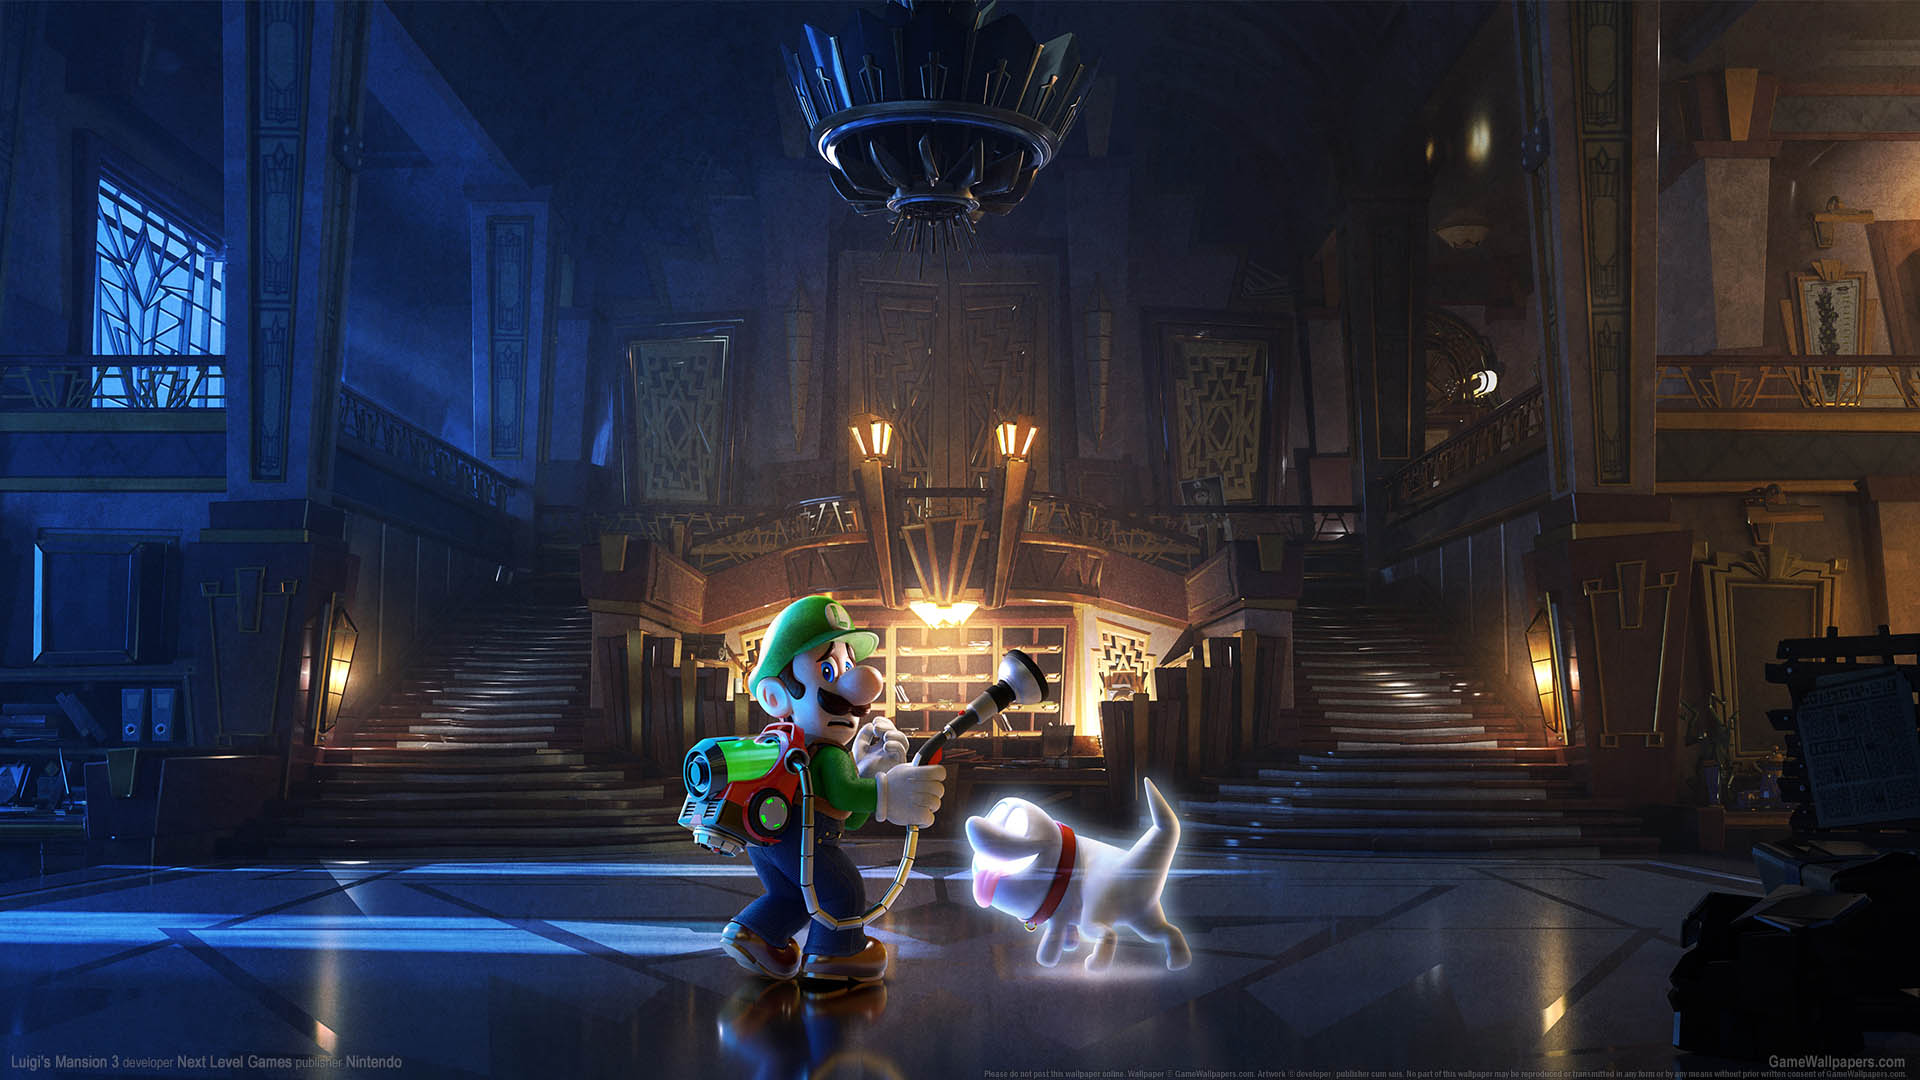 Luigis Mansion 3 Fondo De Escritorio 02 1920x1080